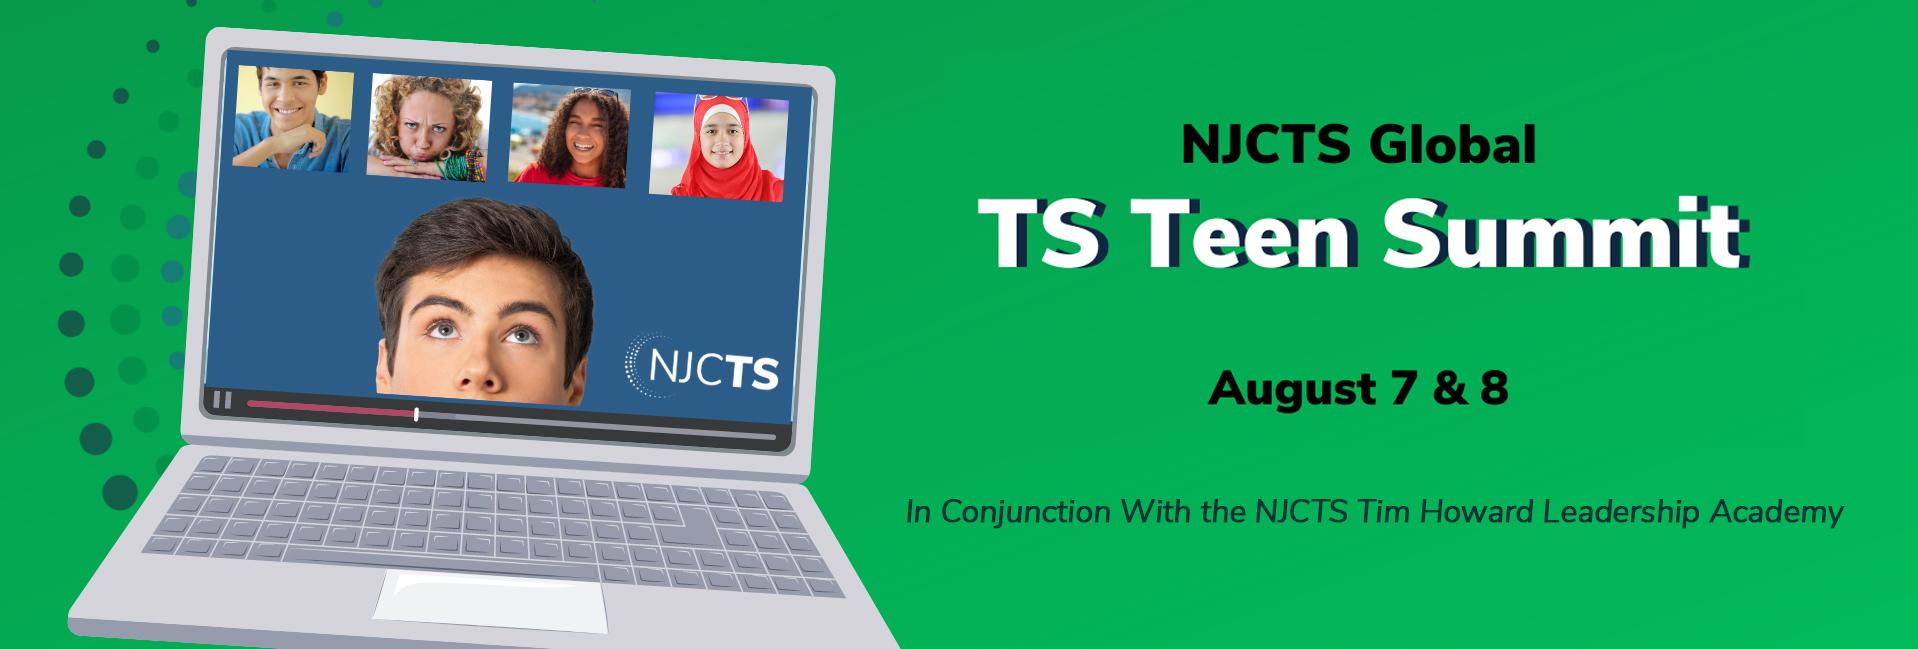 NJCTS Global TS Teen Summit